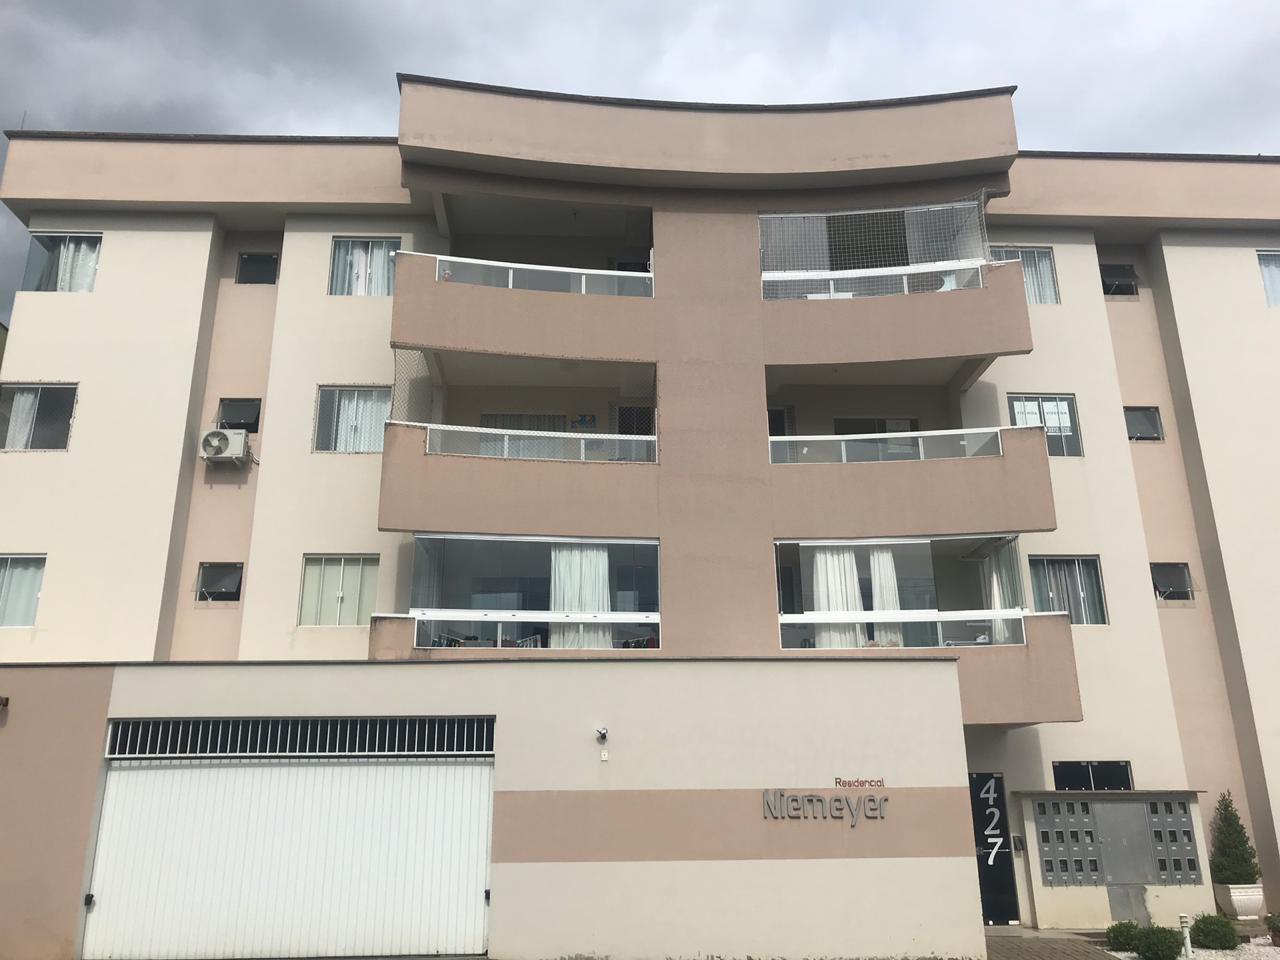 Código: 2865 – Resid. Niemeyer – Baependi – MI nº 72.601